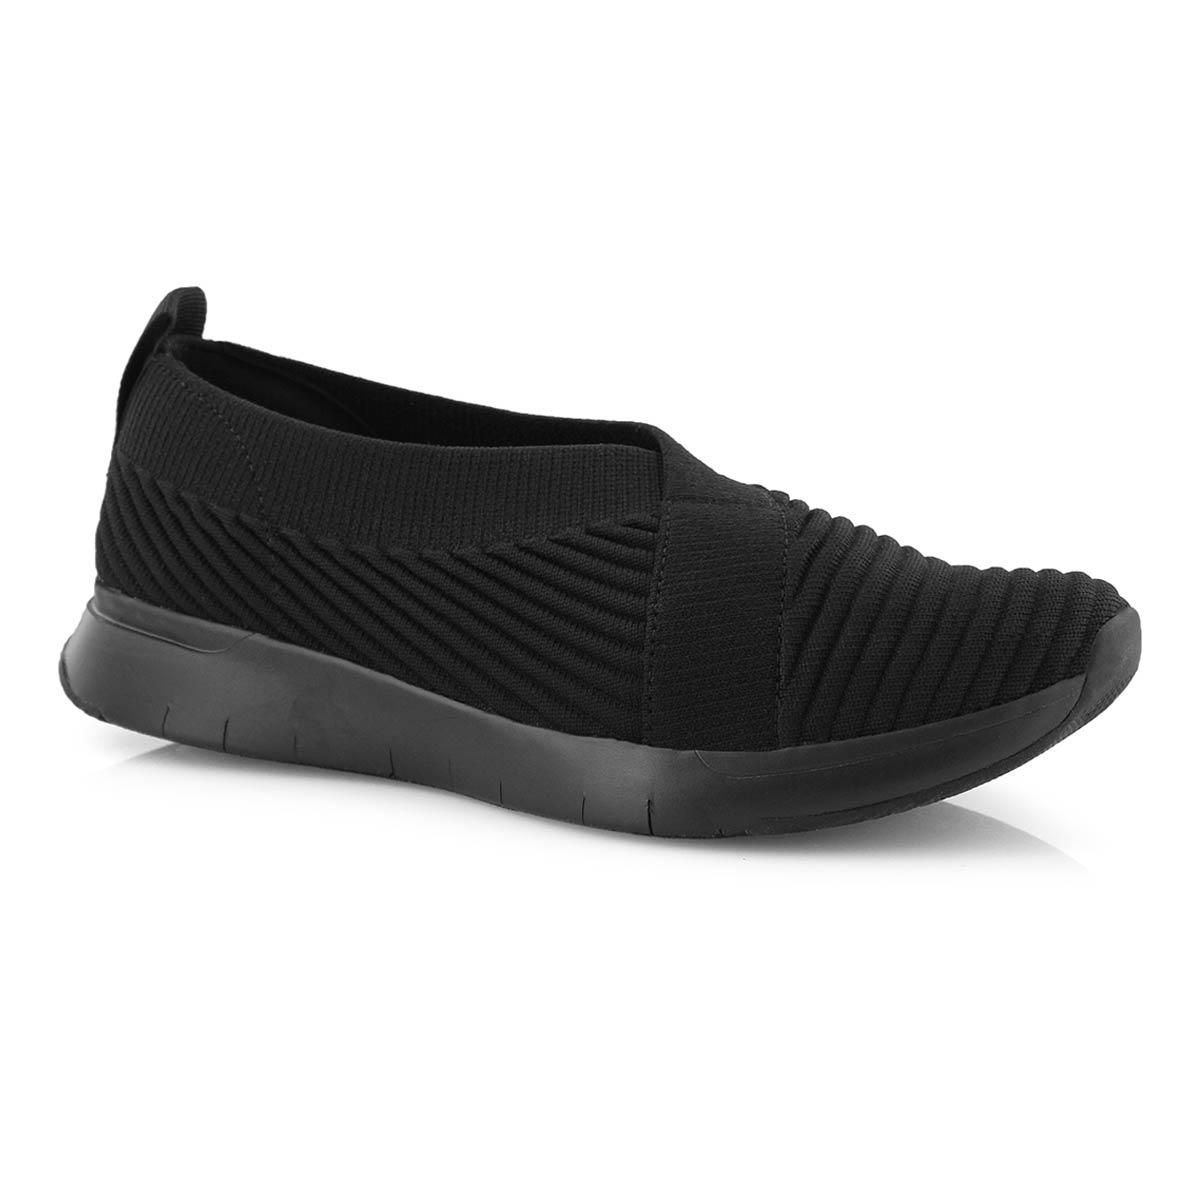 Women's ARTKNIT BALLERINA black slip on shoe